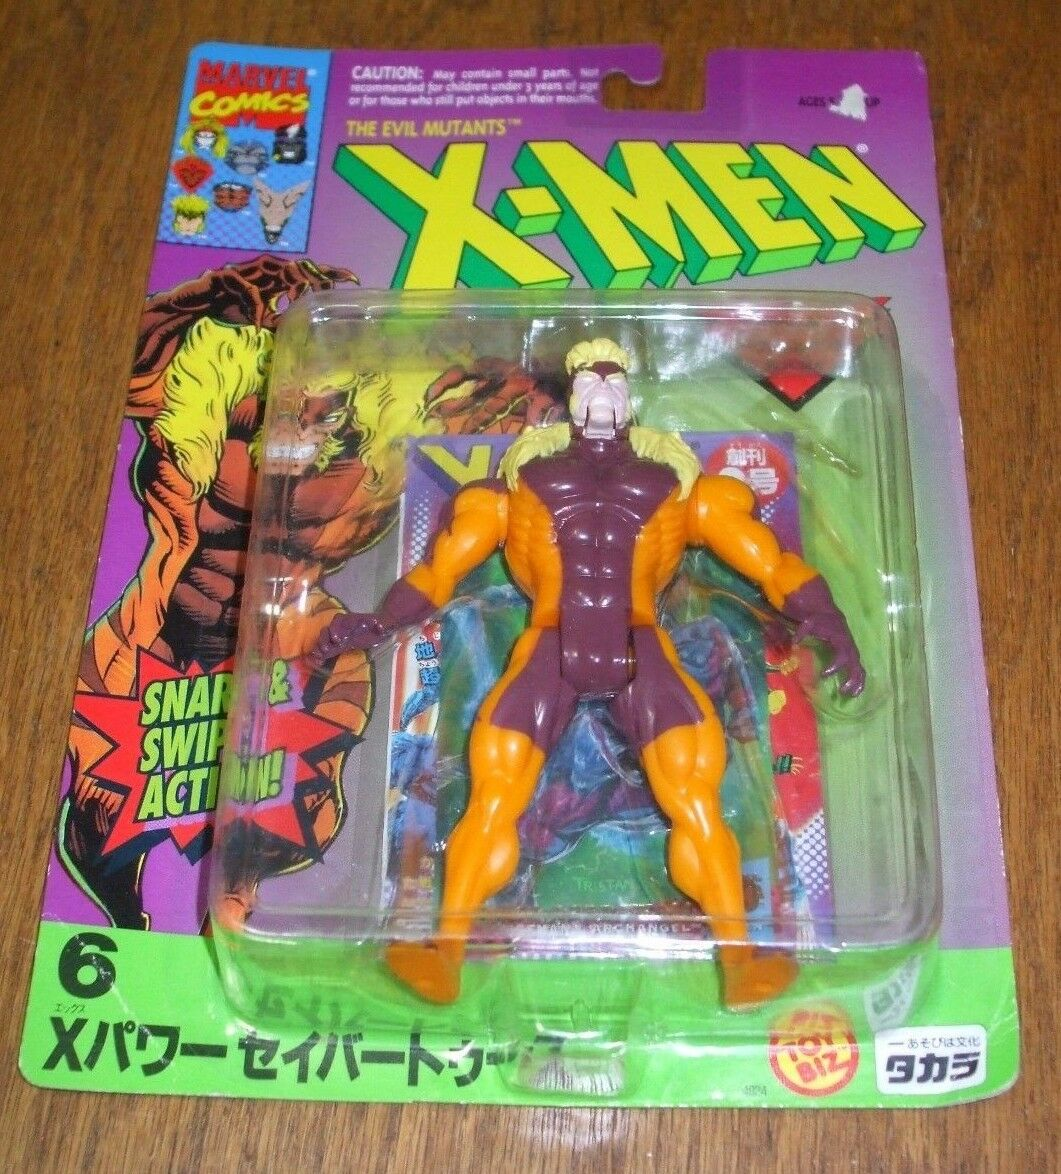 RARE X-Men SABRETOOTH Toy Biz JAPAN Release MOSC 1994 Mutant Action Figure WOW